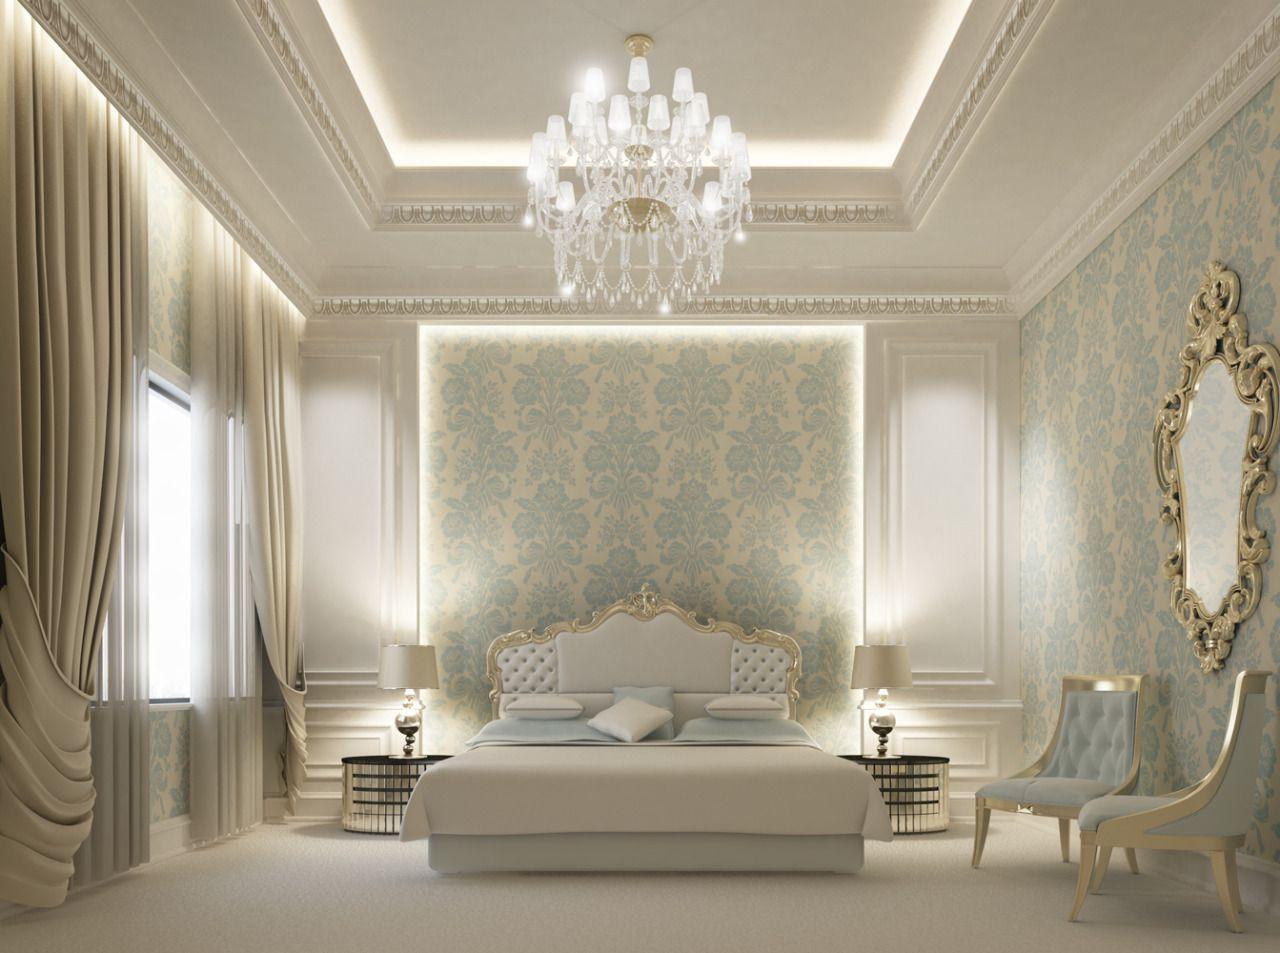 Interior bedroom design in Dubai